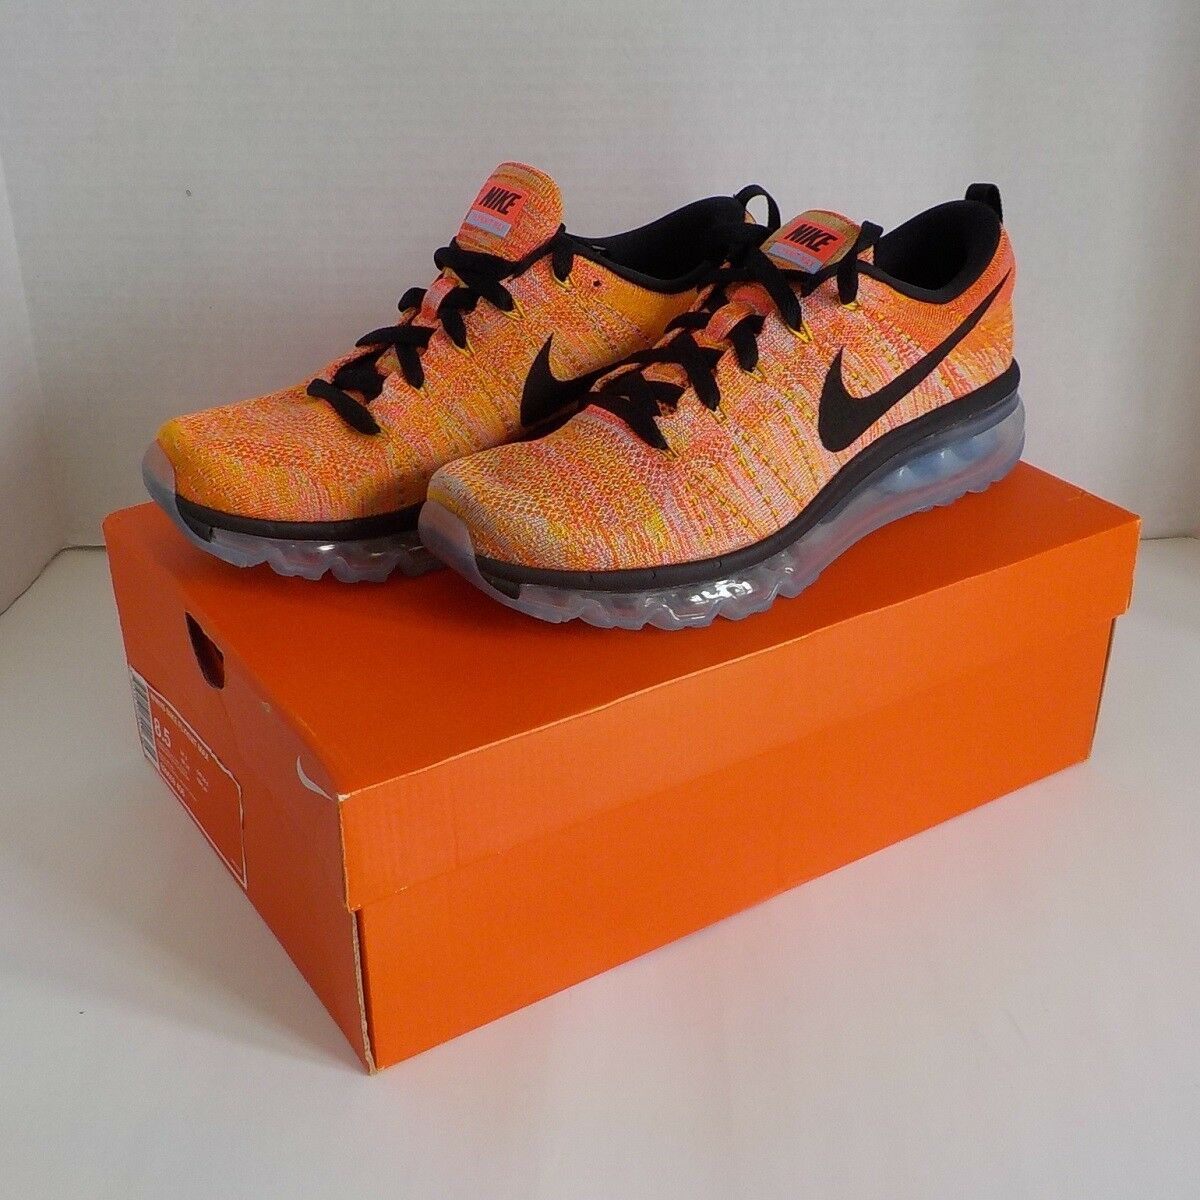 Nike FLYKNIT MAX Running Shoes HOT PUNCH 620659 406 WOMAN 8.5 Fast Ship NIB 225